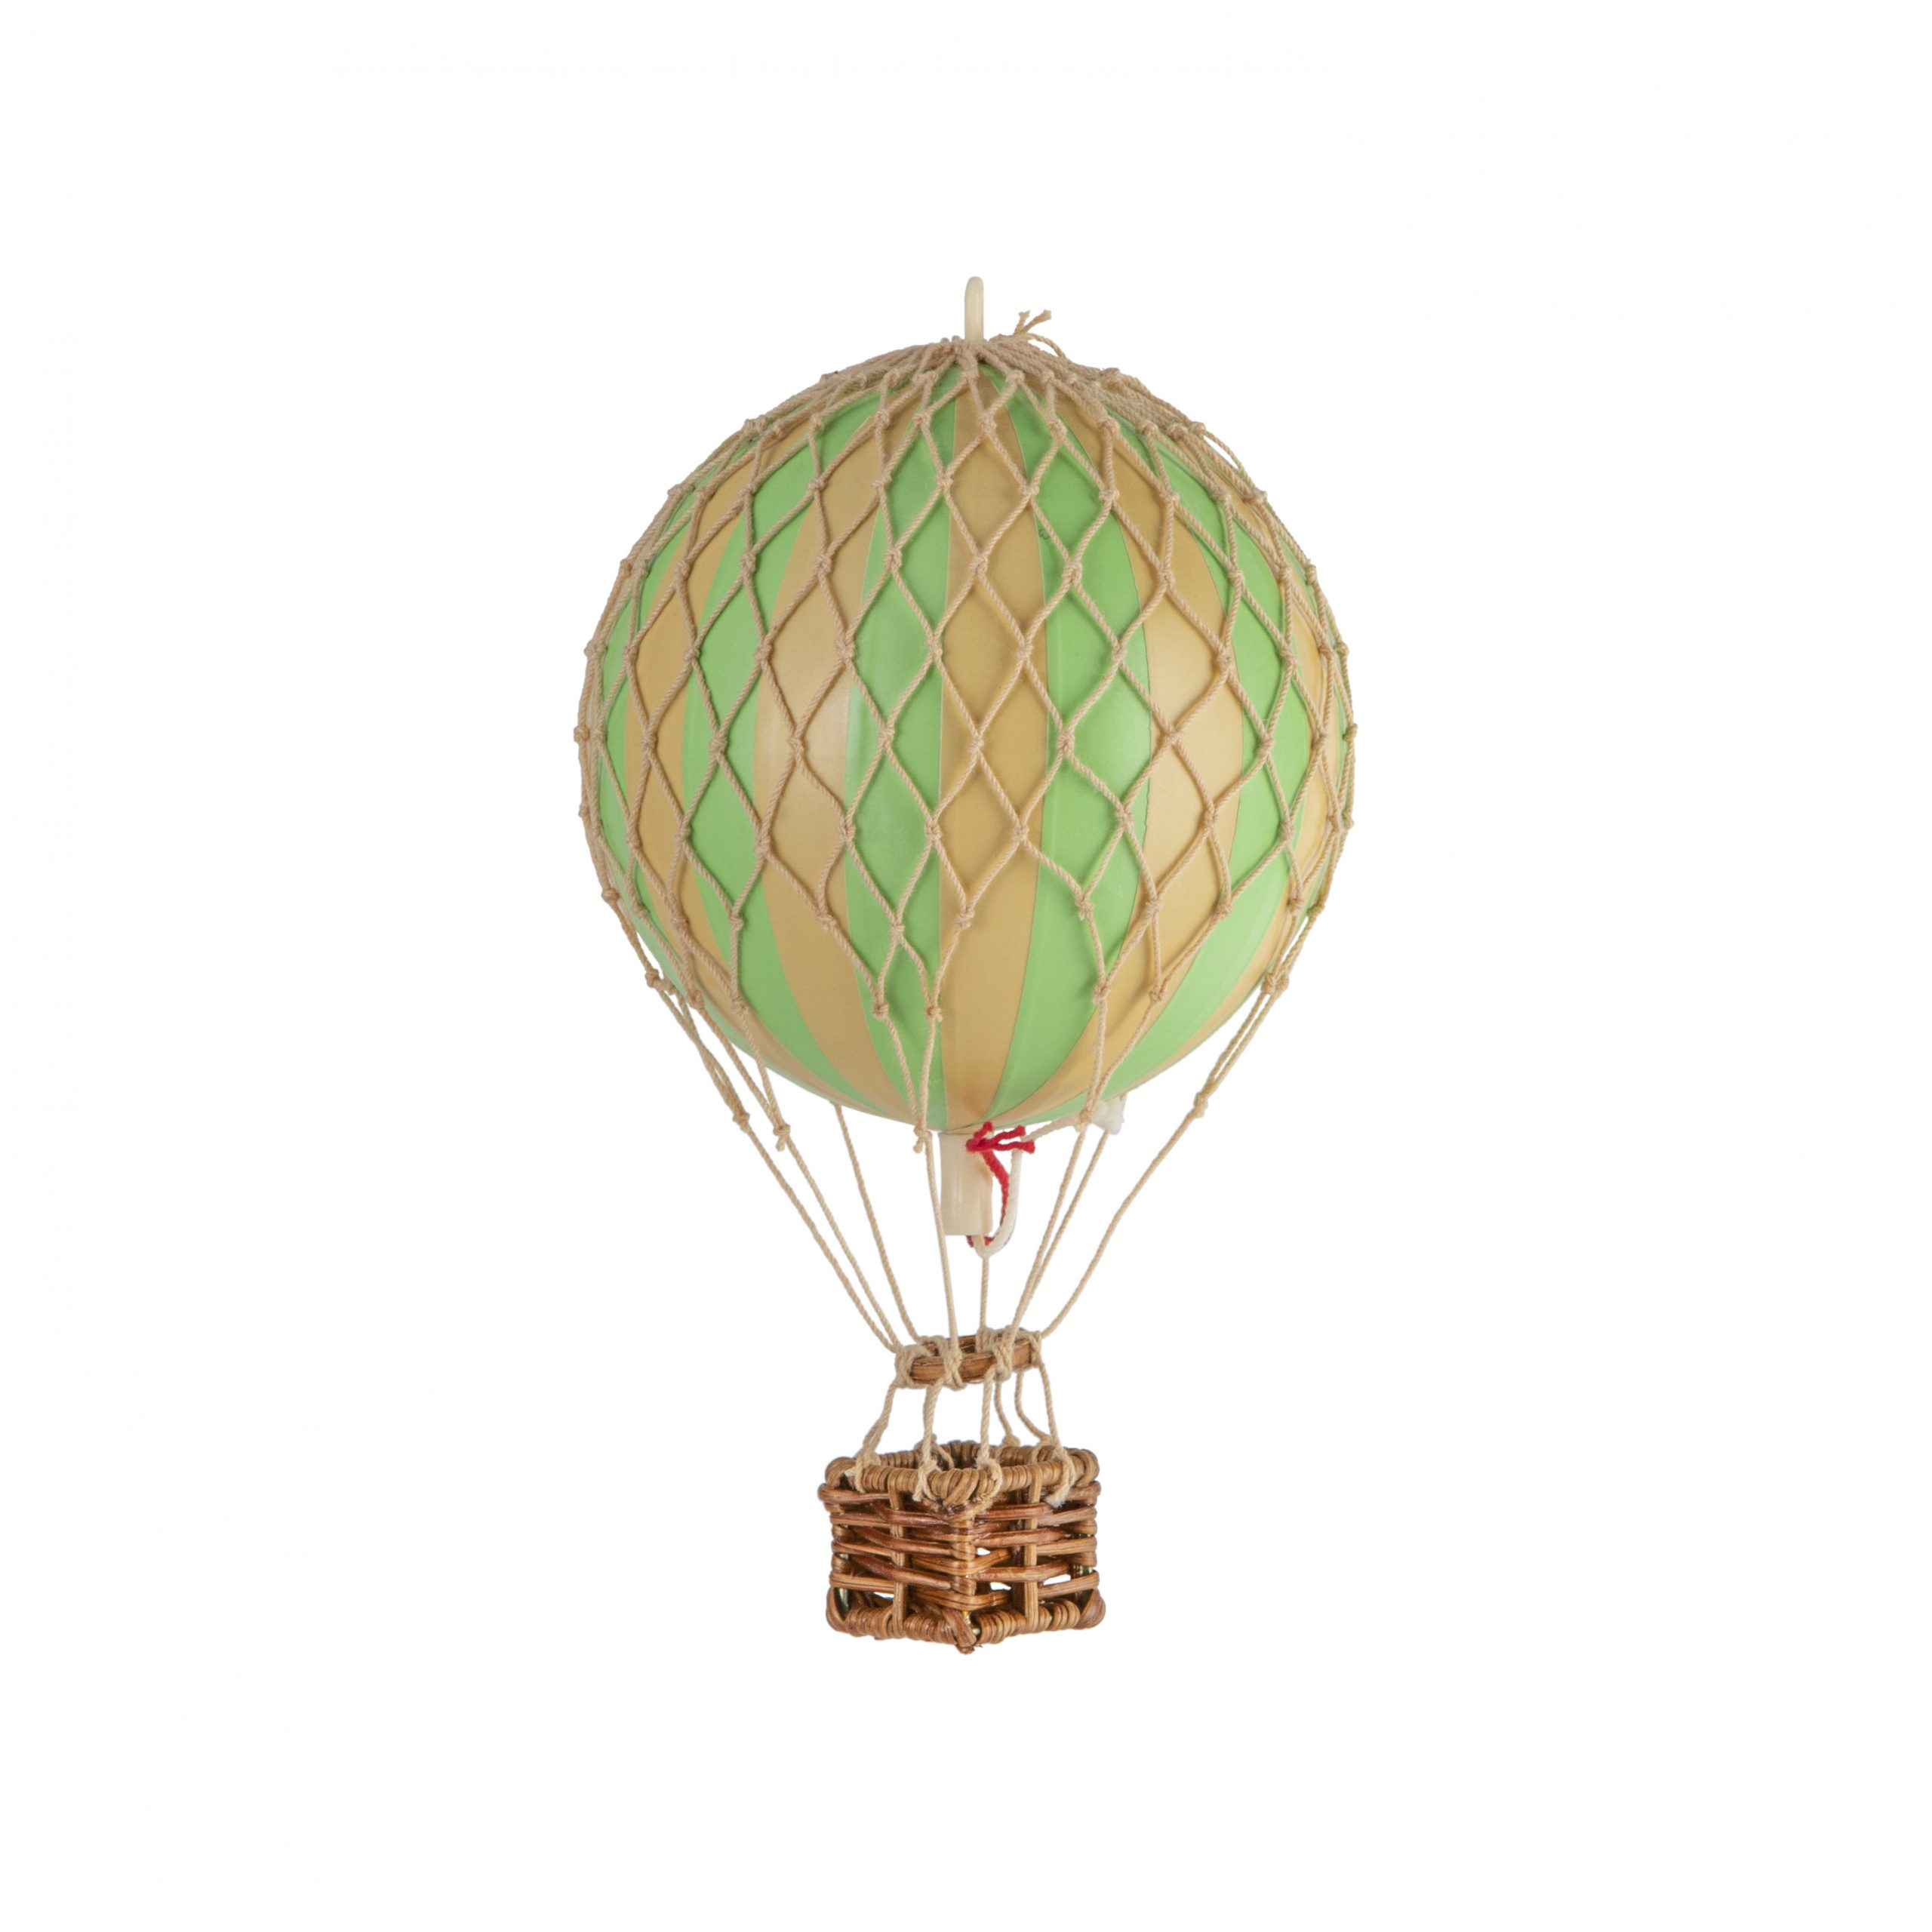 כדור פורח – ירוק בהיר